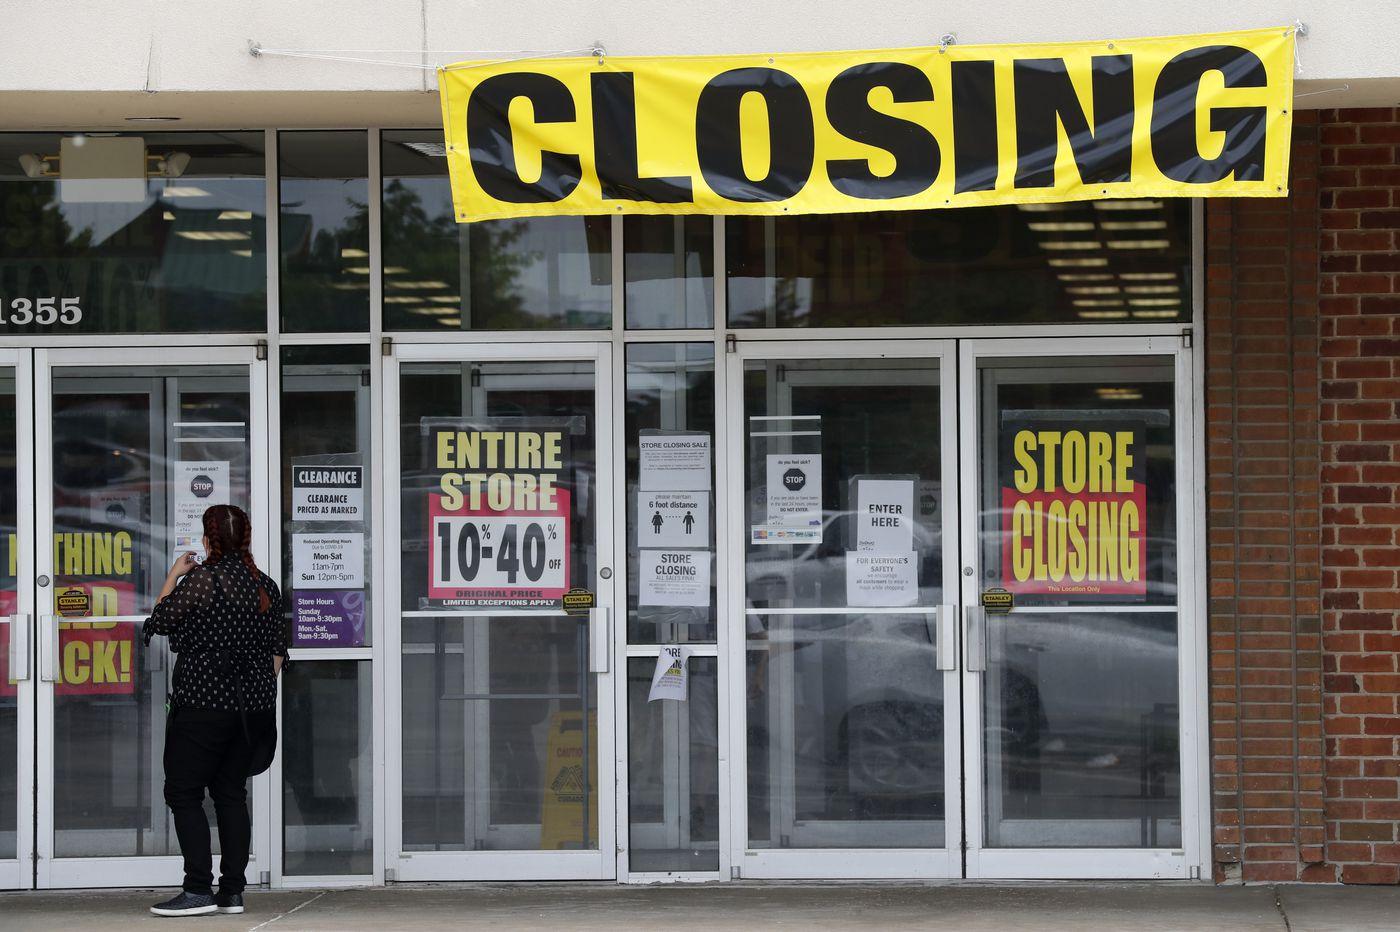 U.S. consumer spending sinks by record 13.6% in face of coronavirus